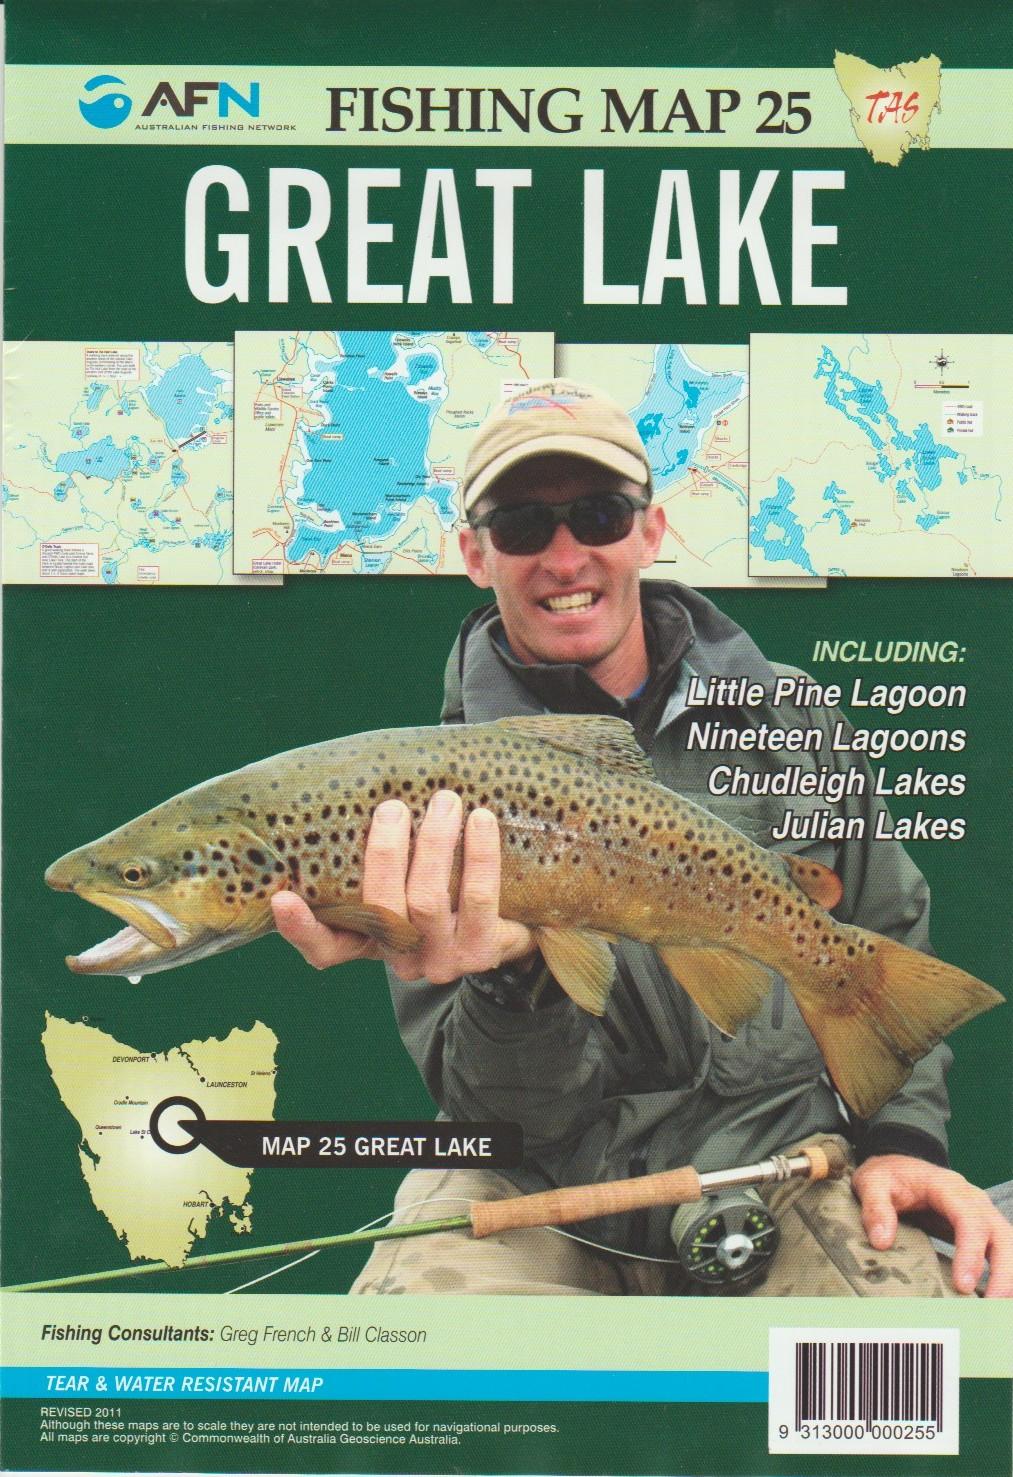 Fishing Map # 25 Great Lake including Nineteen Lagoons, Little Pine Lagoon